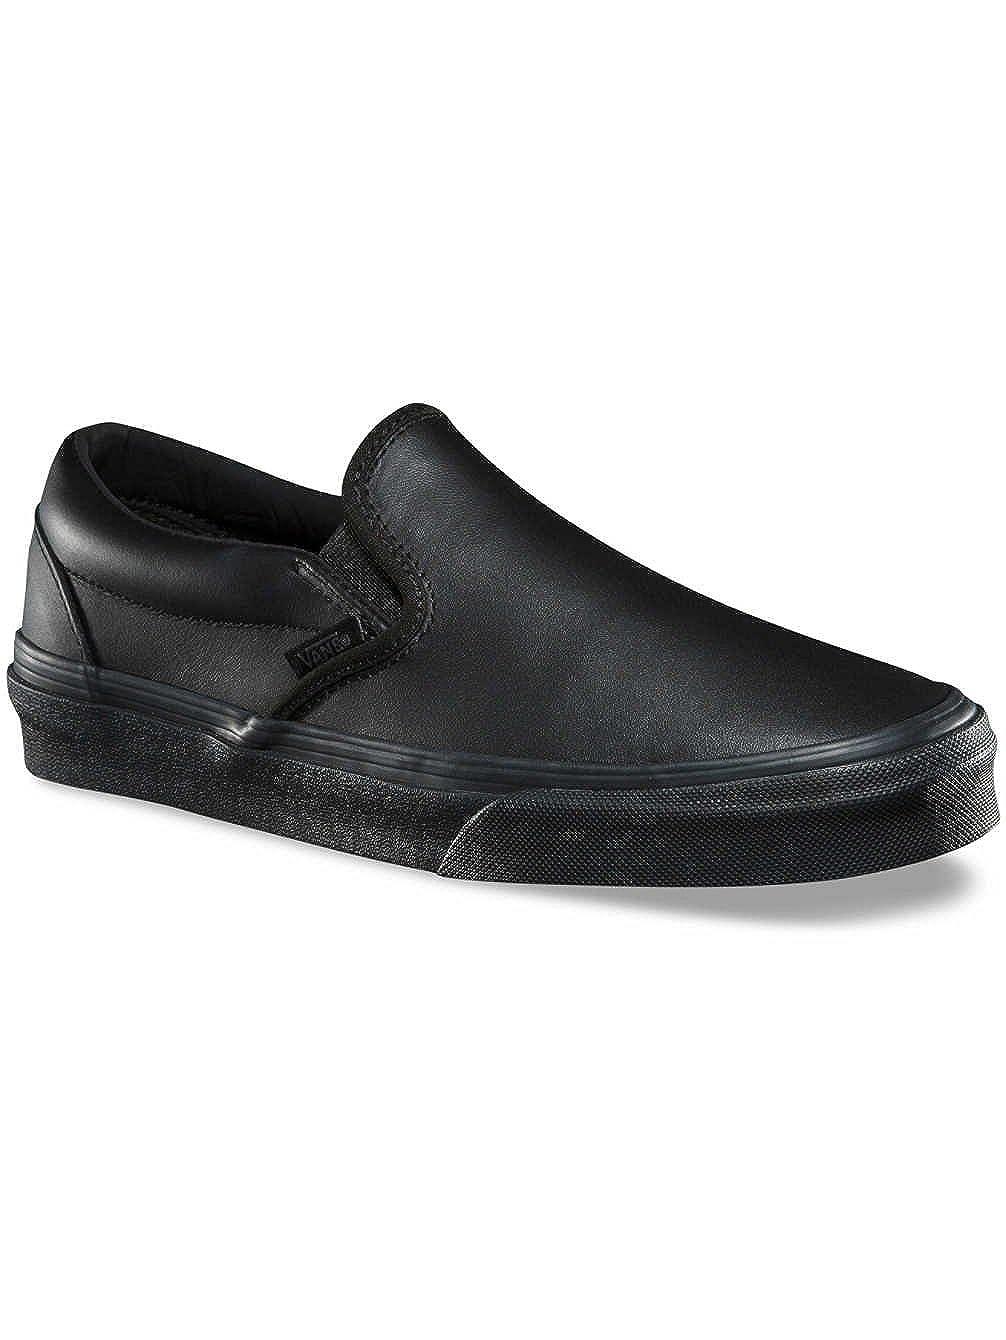 03ec00dc7fb08f Vans Slip ONS Men Classic Slip-On DX Slippers  Amazon.co.uk  Shoes   Bags